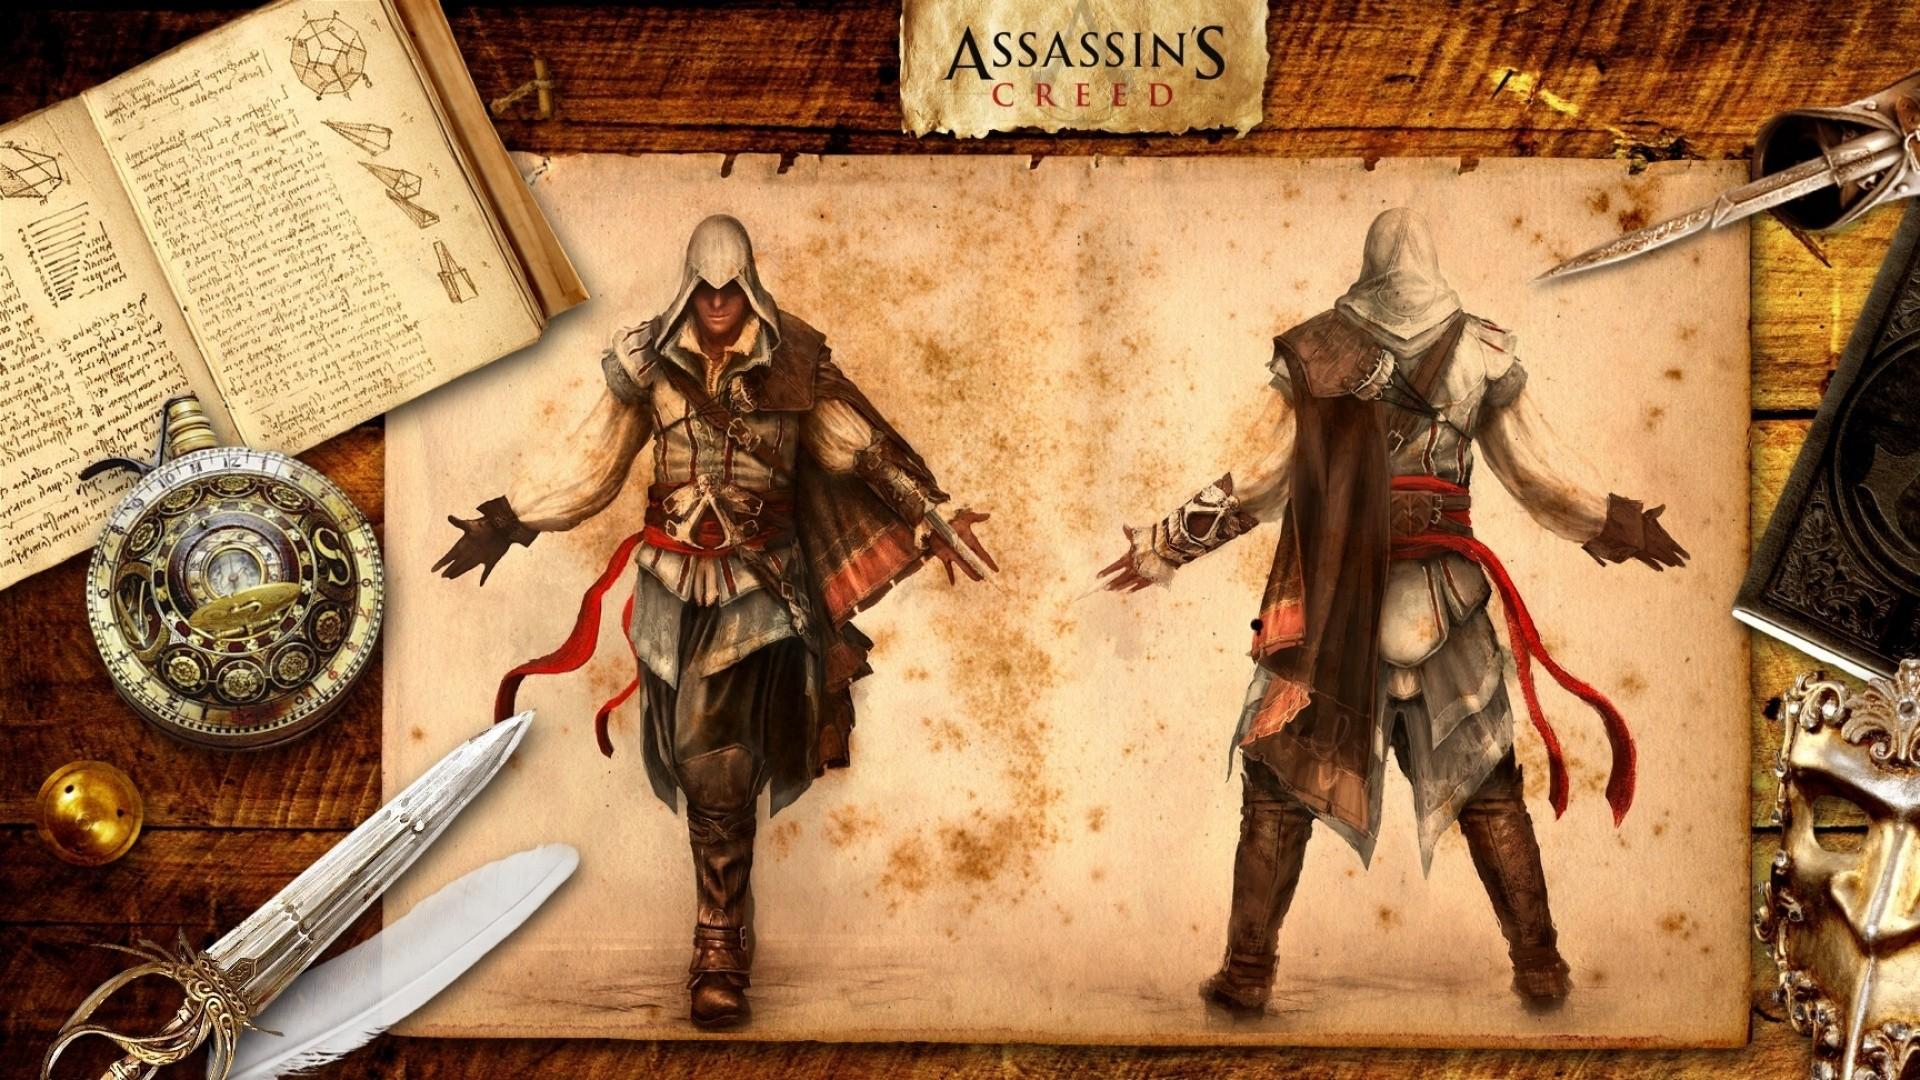 Assassin's Creed 2 Wallpaper 1920x1080